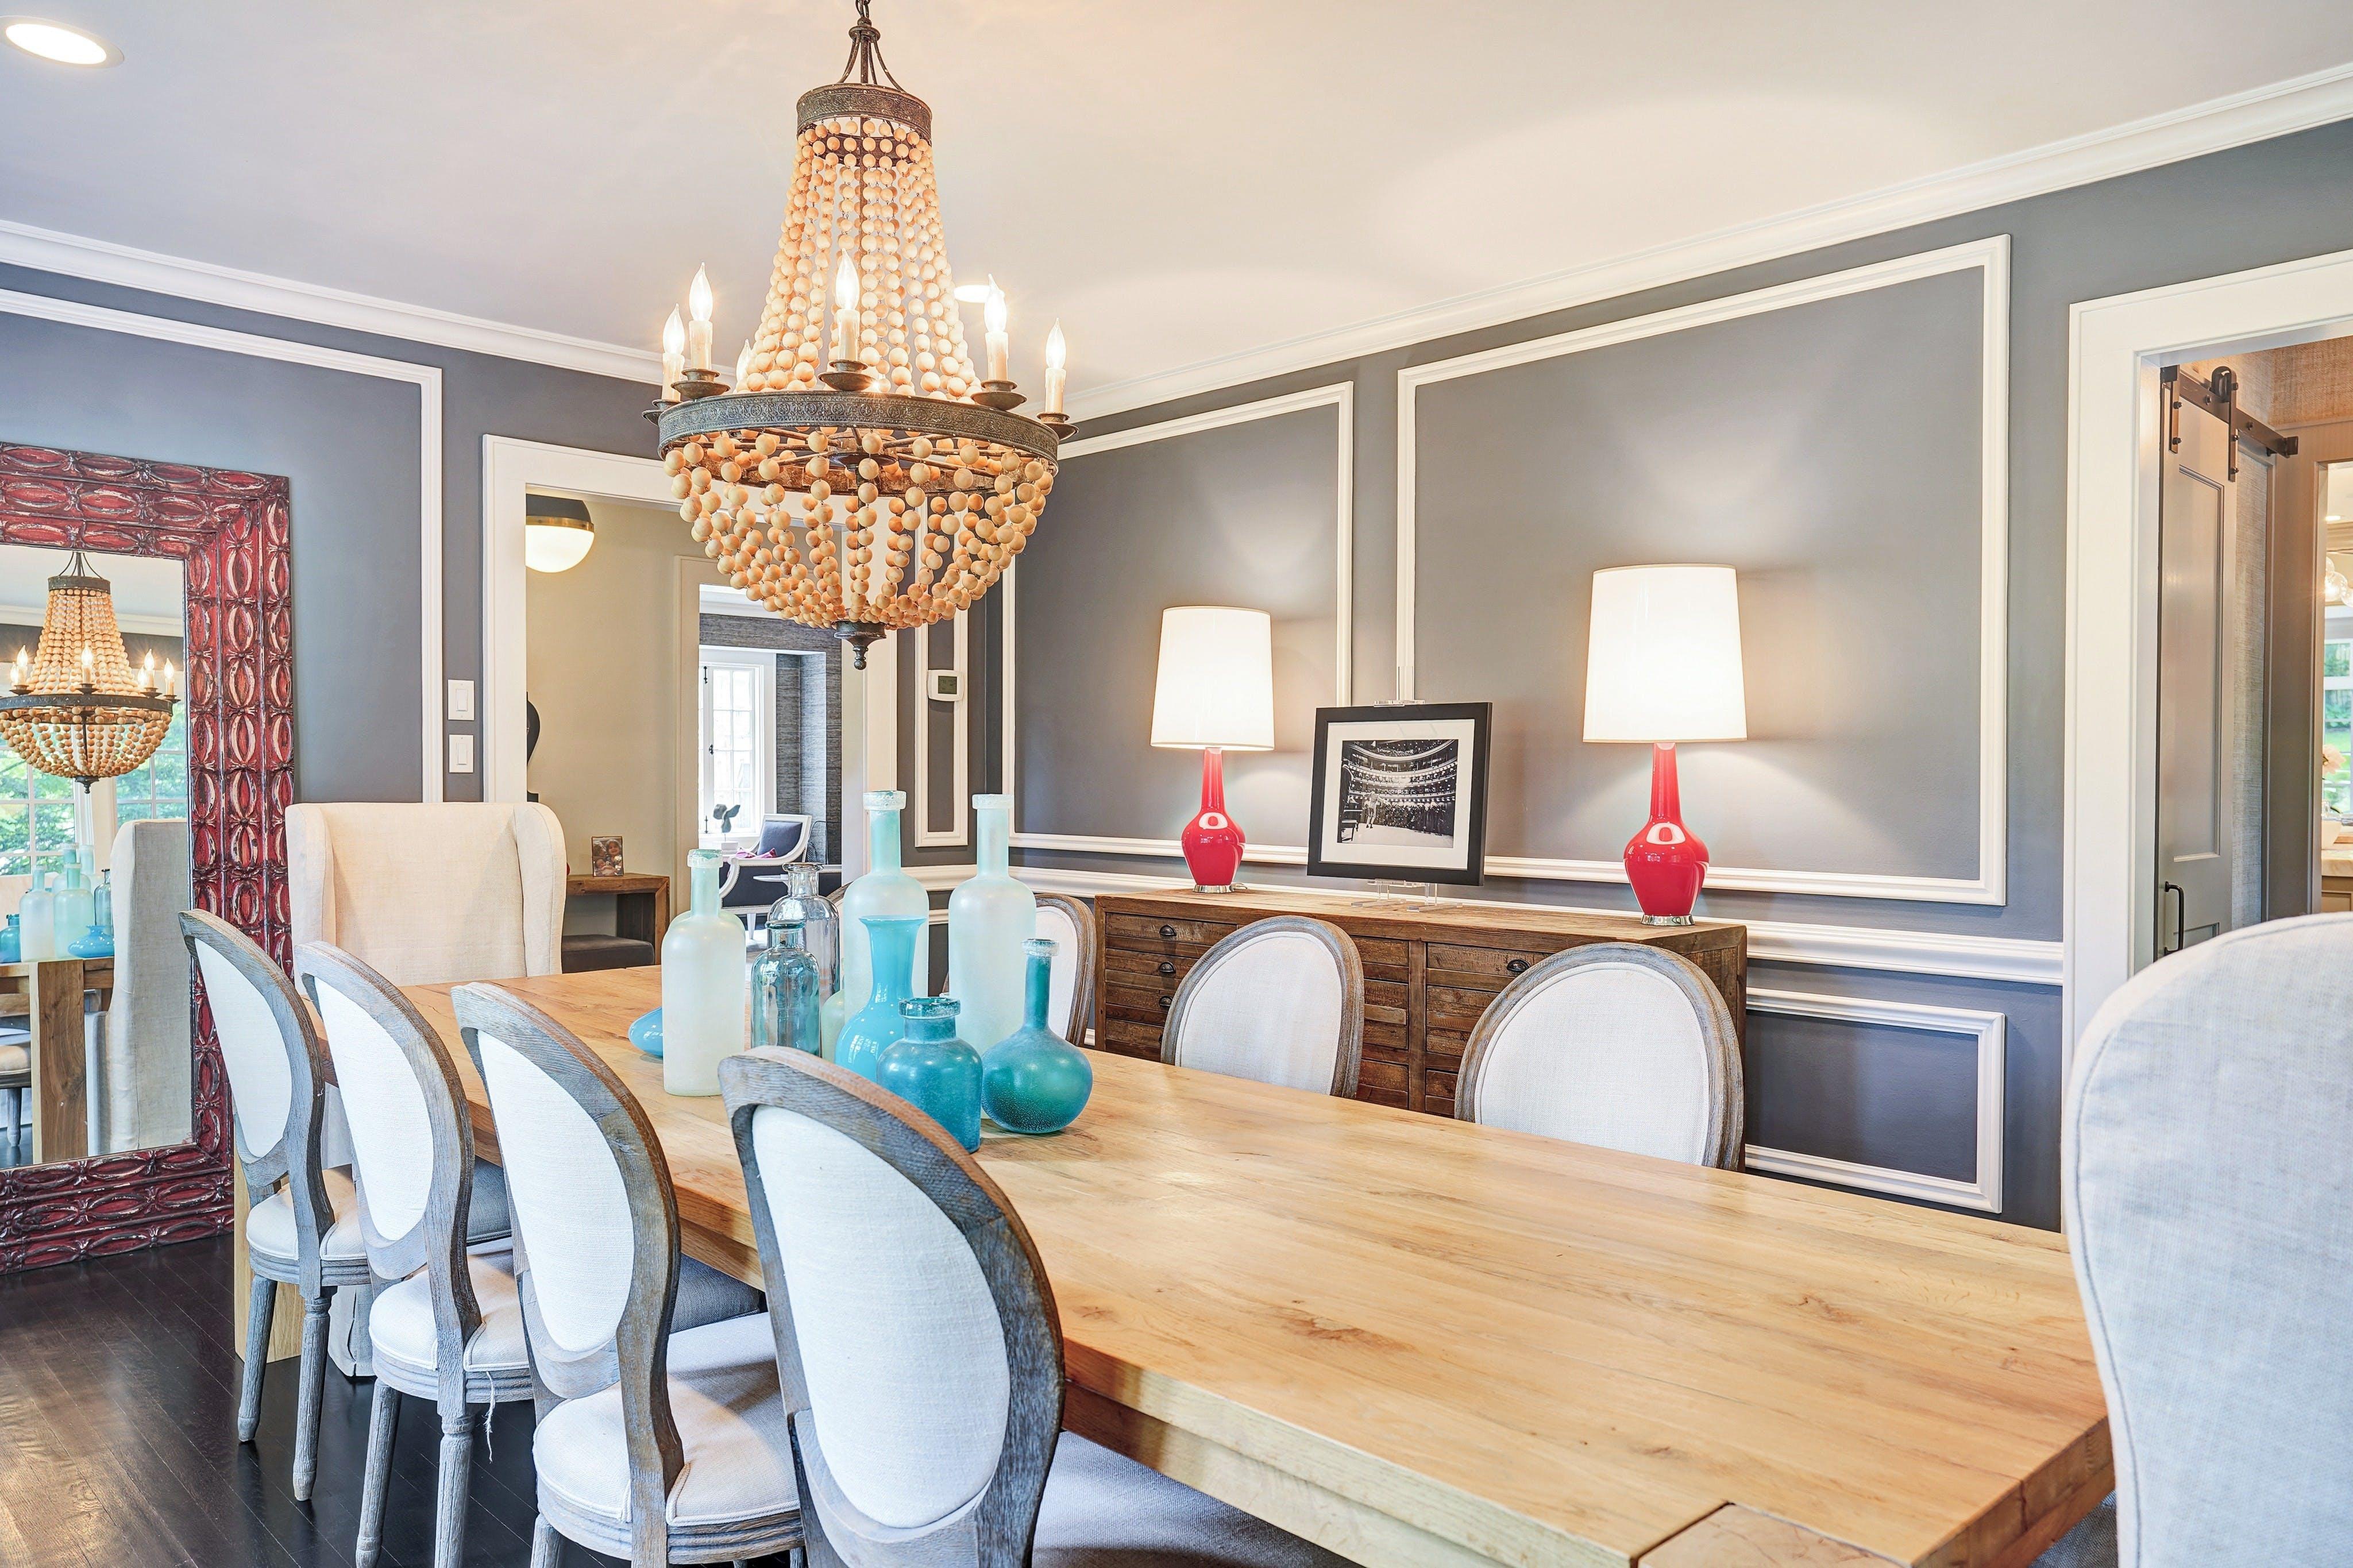 34 Dogwood Drive Dining Room